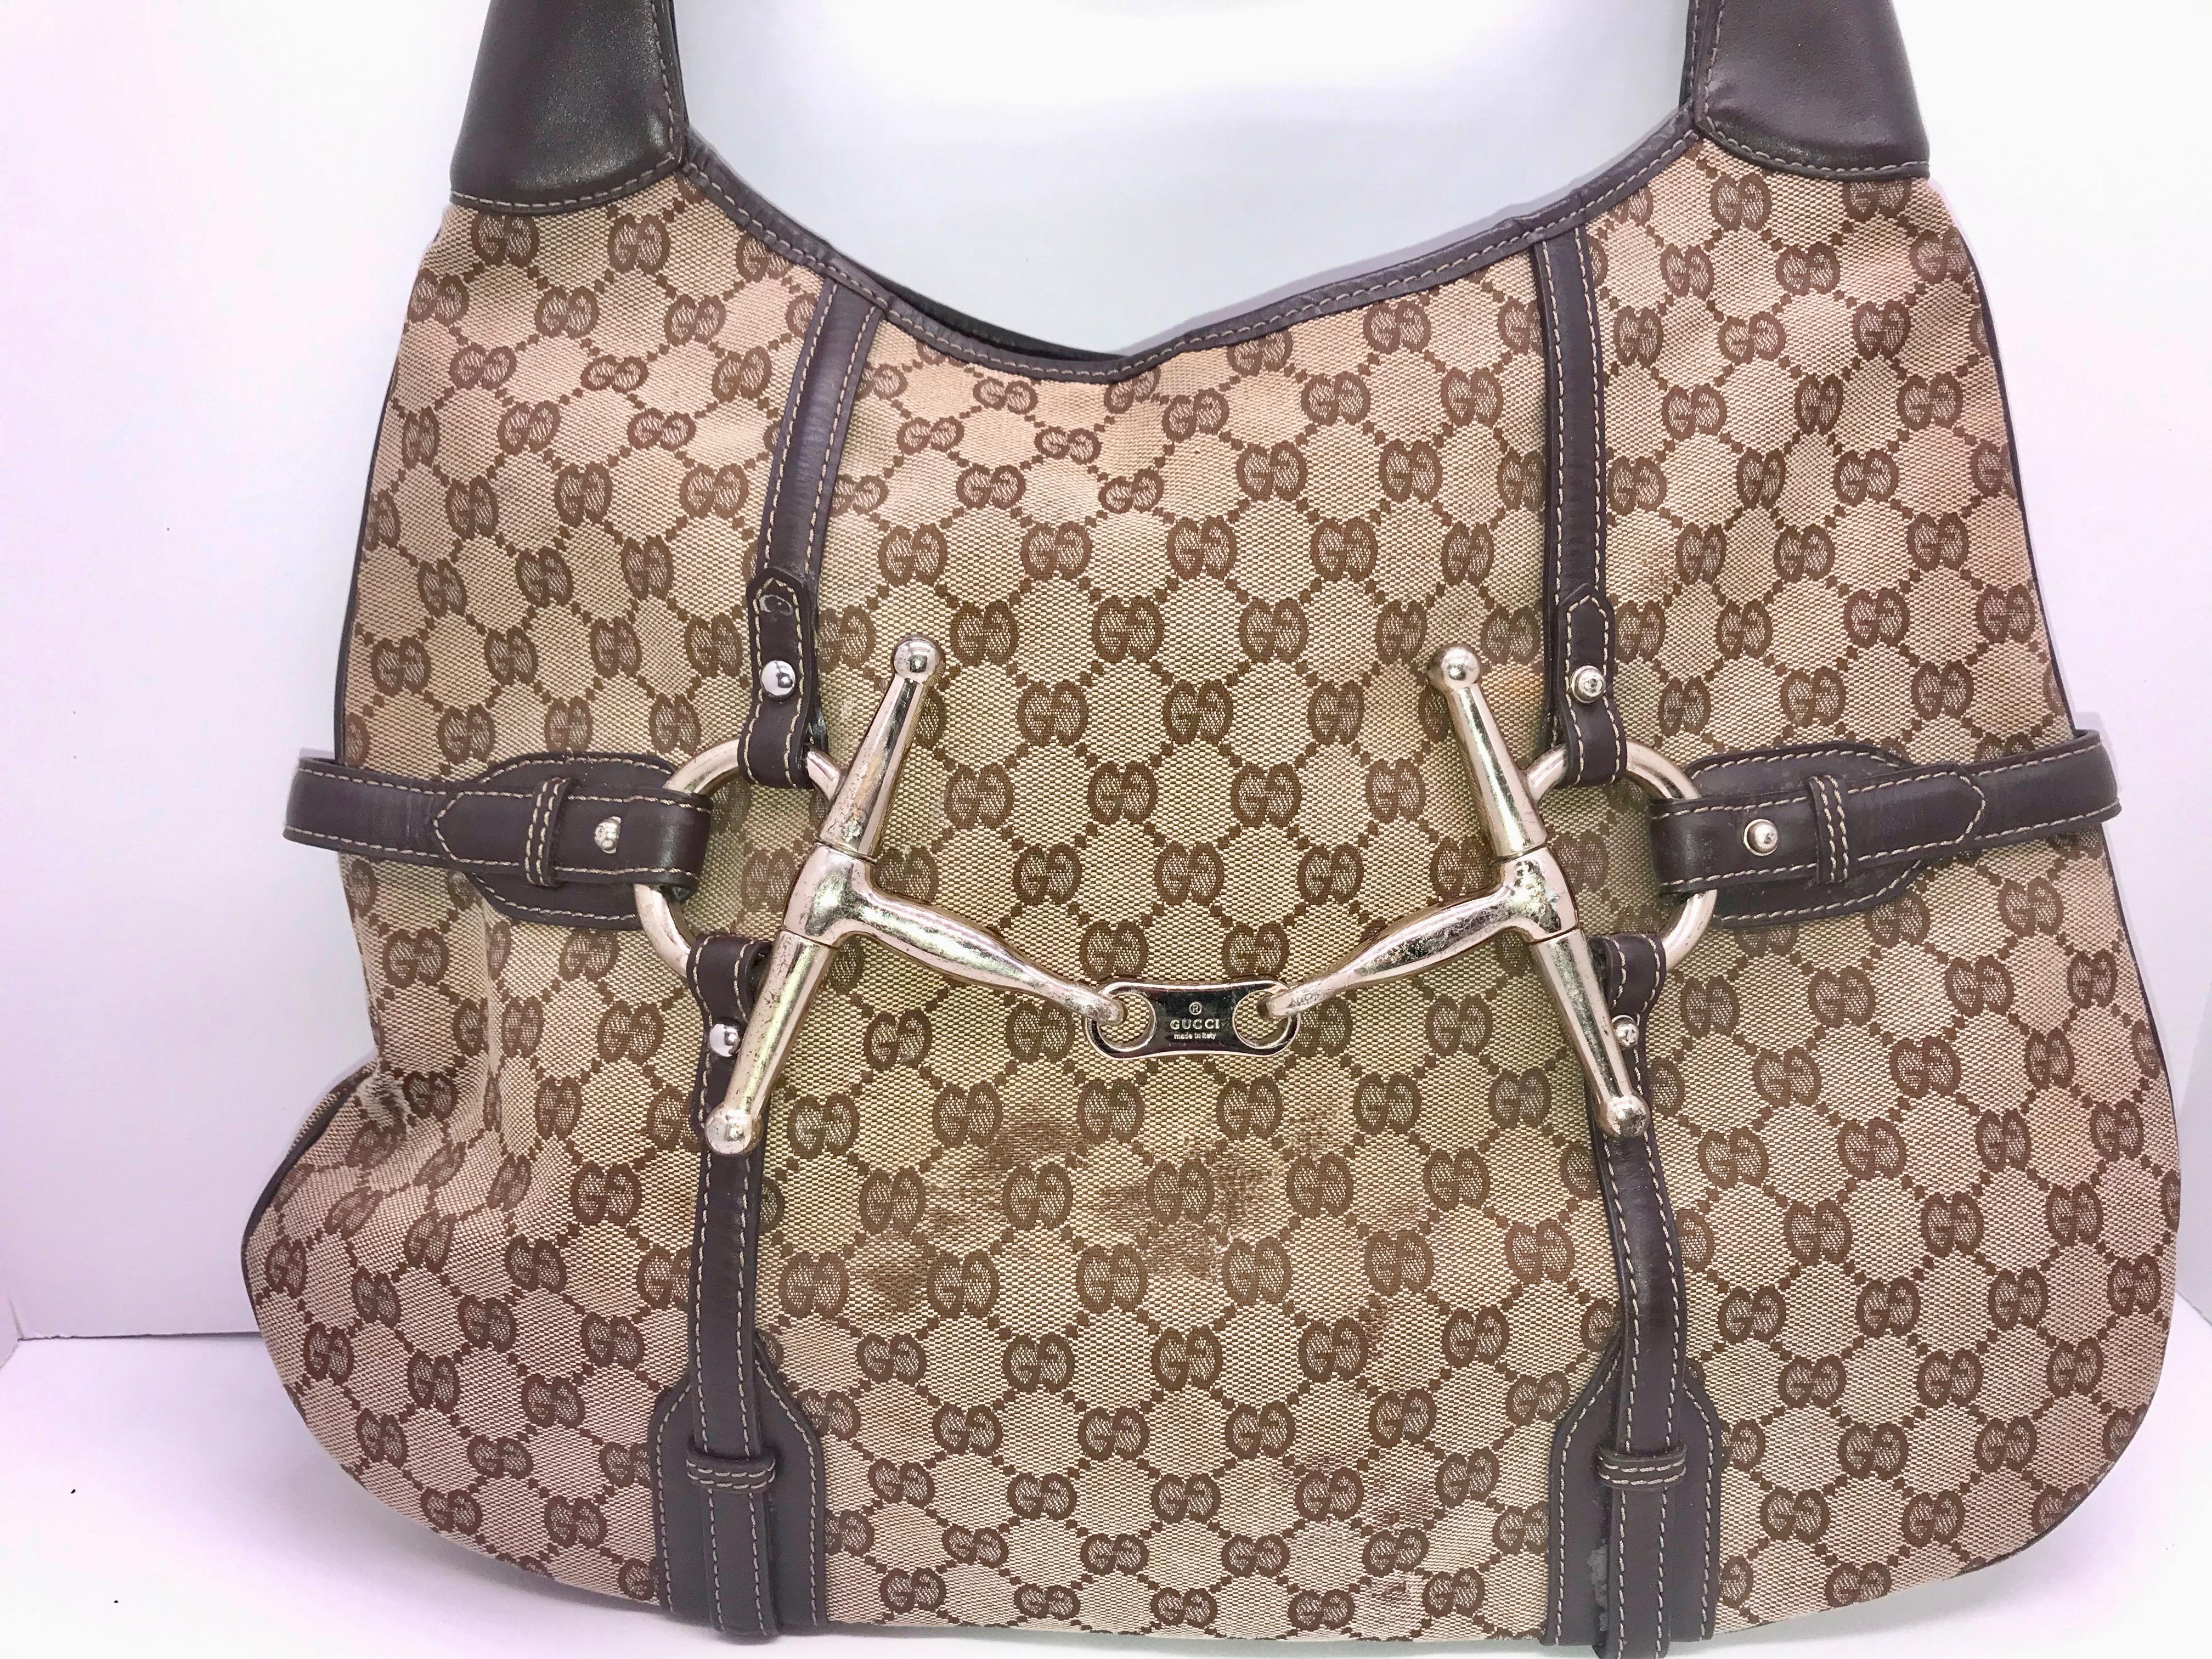 064c586bac5 Gucci Horsebit Hobo 85th Anniversary Special Edition Handbag Purse ...